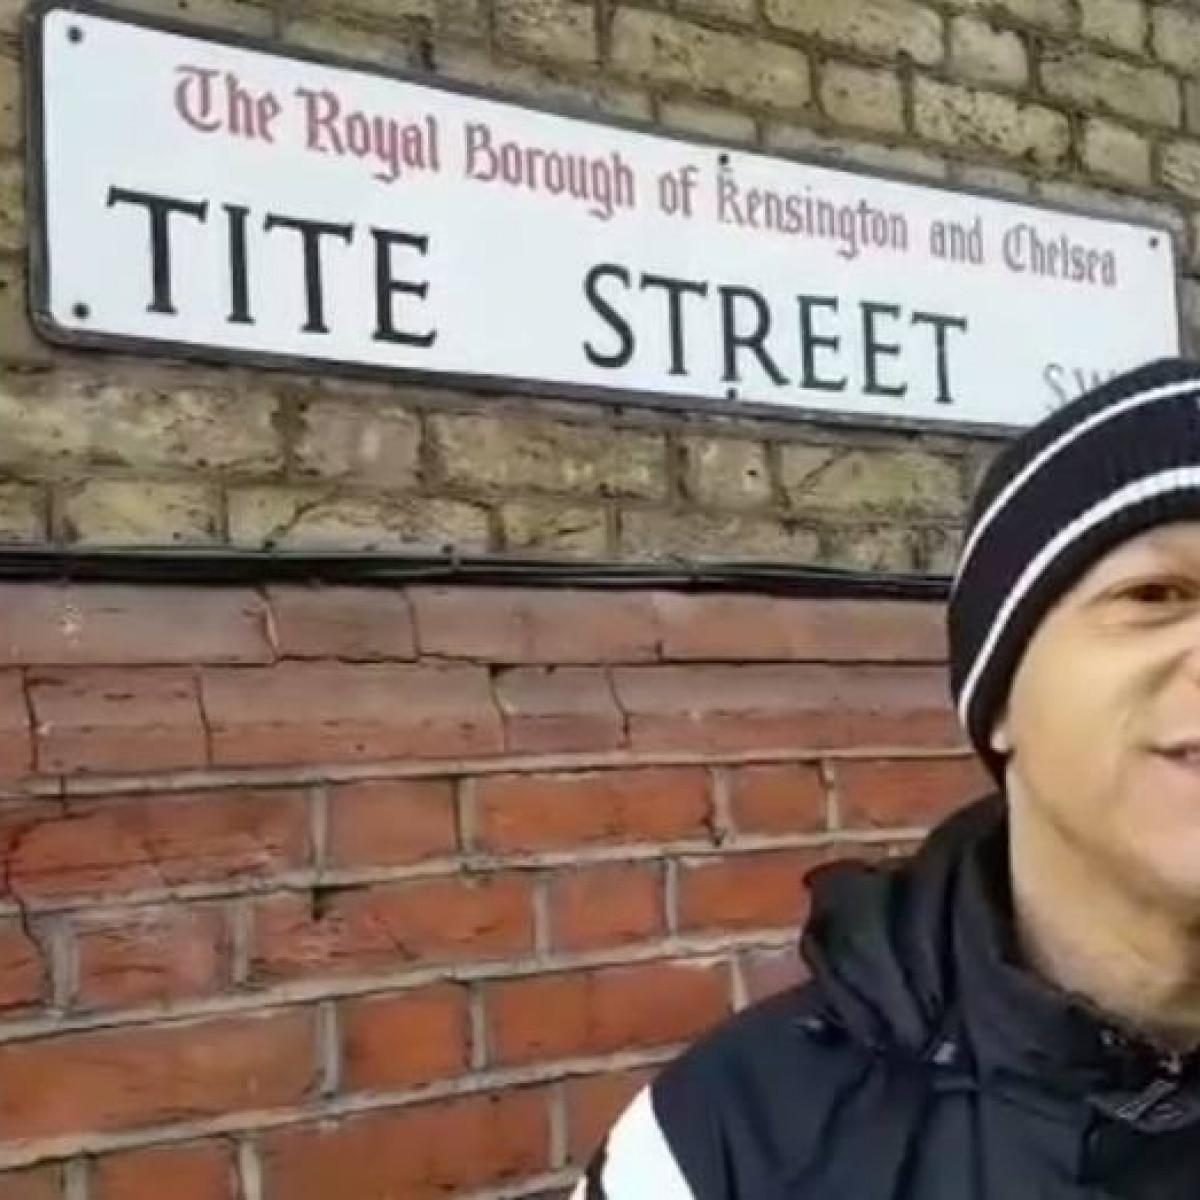 Torcedor emociona treinador com simpatia para hexa na  Tite Street  -  Futebol - Fera f11346ee50c51